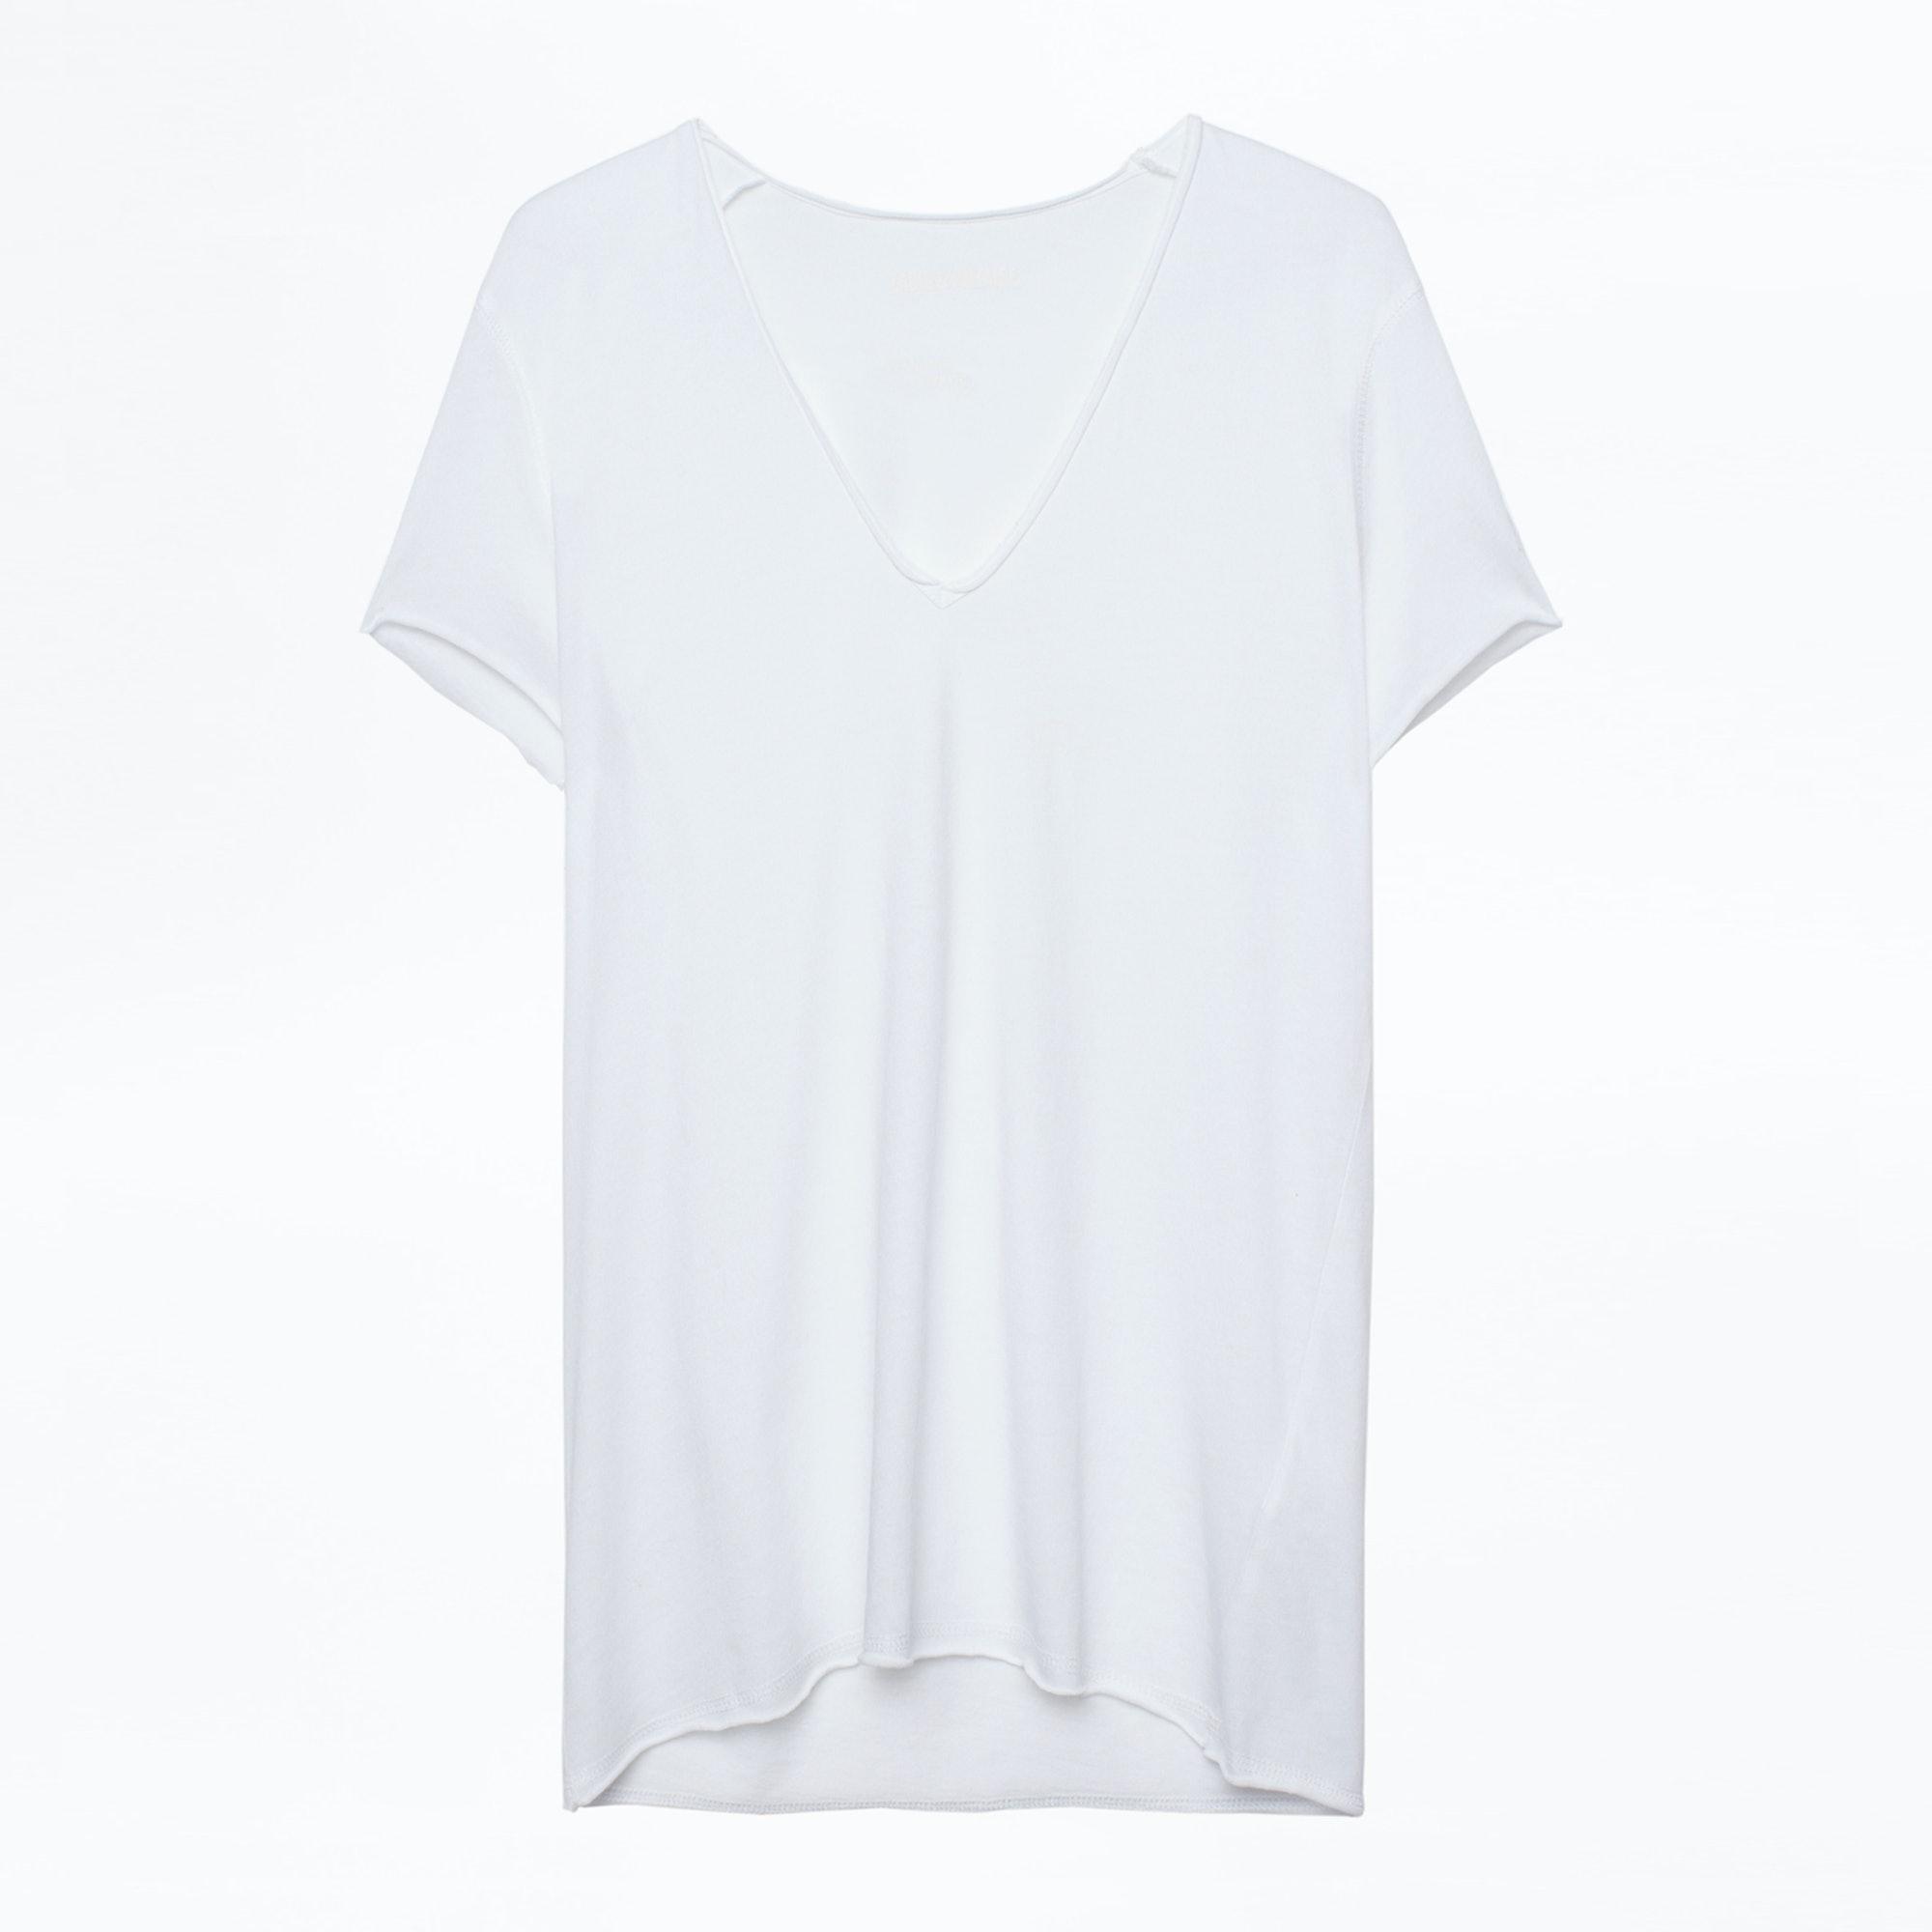 T-shirt Story Fishnet - Taille L  - Zadig & Voltaire - Modalova